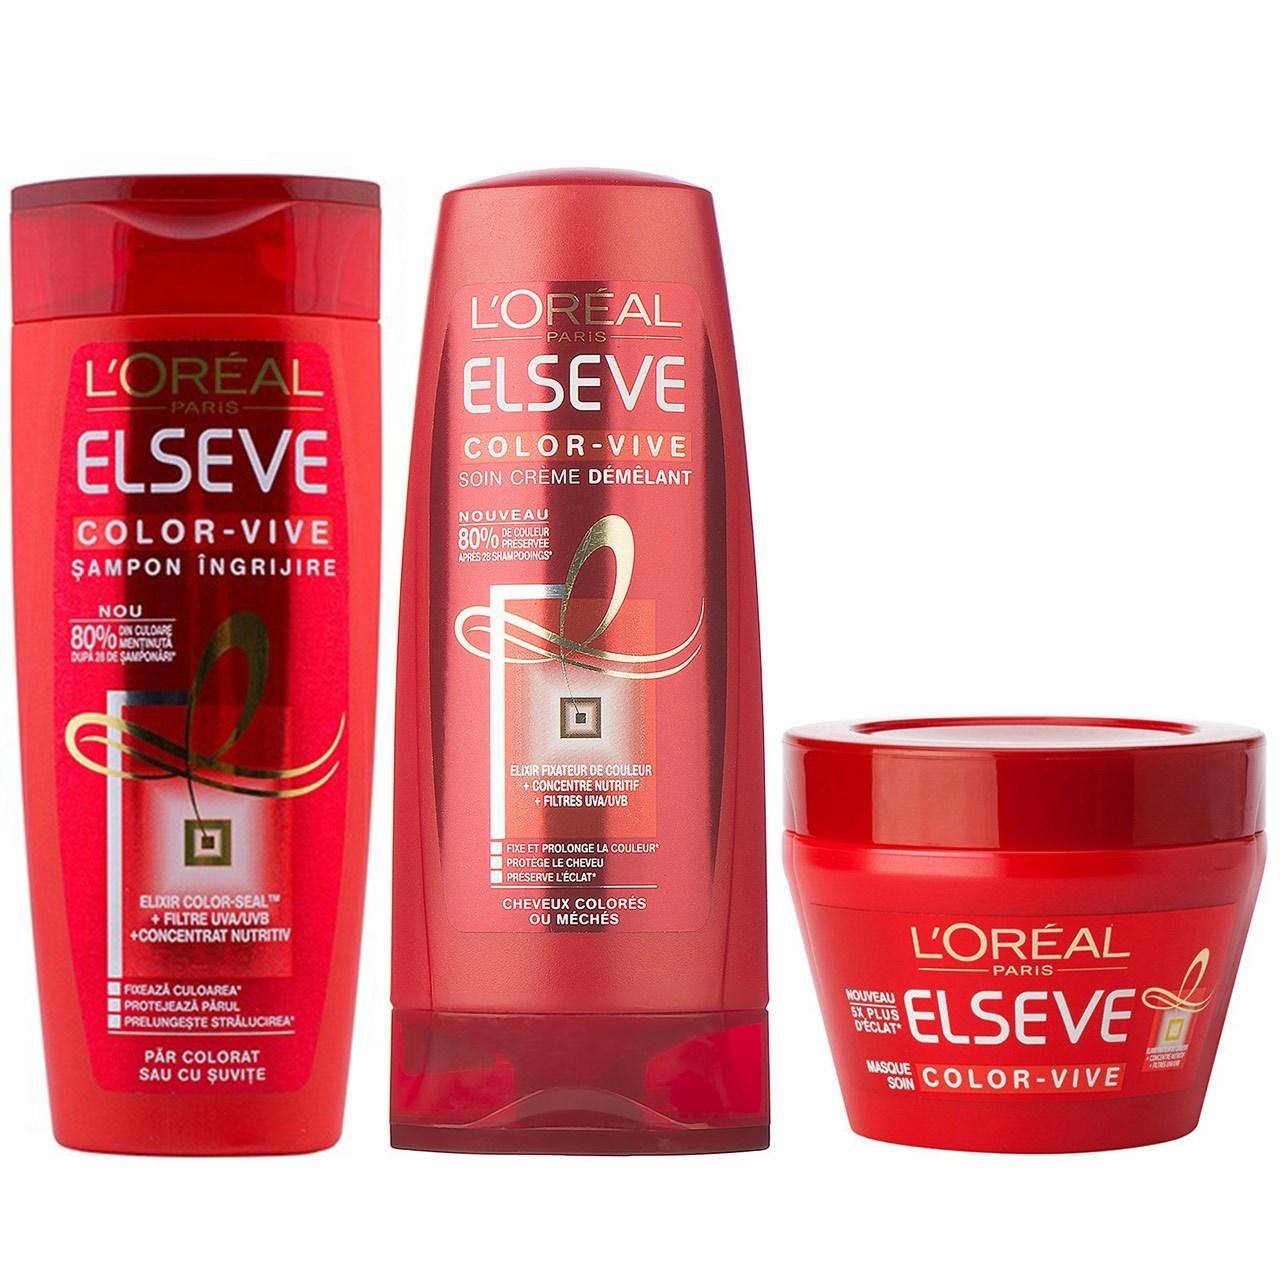 قیمت پک تثبیت کننده رنگ مو لورآل سری Elseve مدل Color Vive بسته 3 عددی